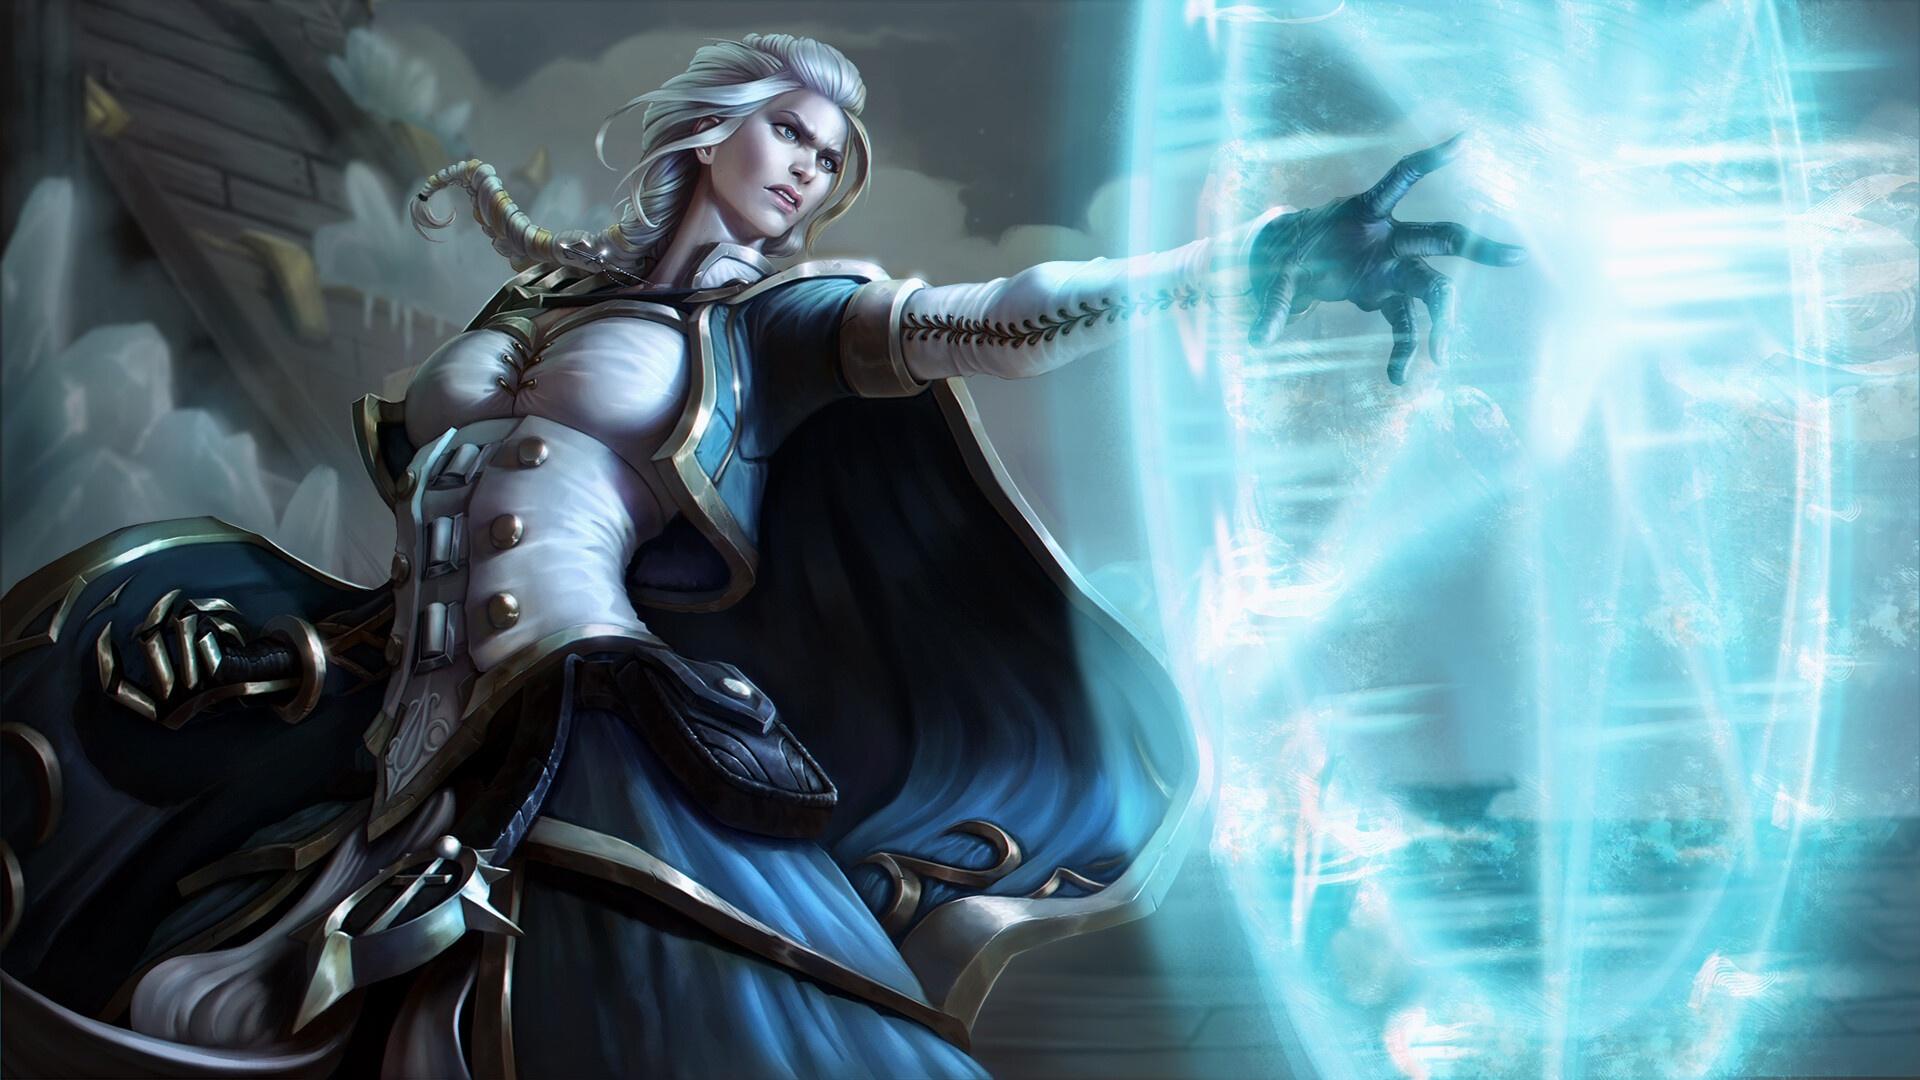 World Of Warcraft Hd Wallpaper Background Image 1920x1080 Id